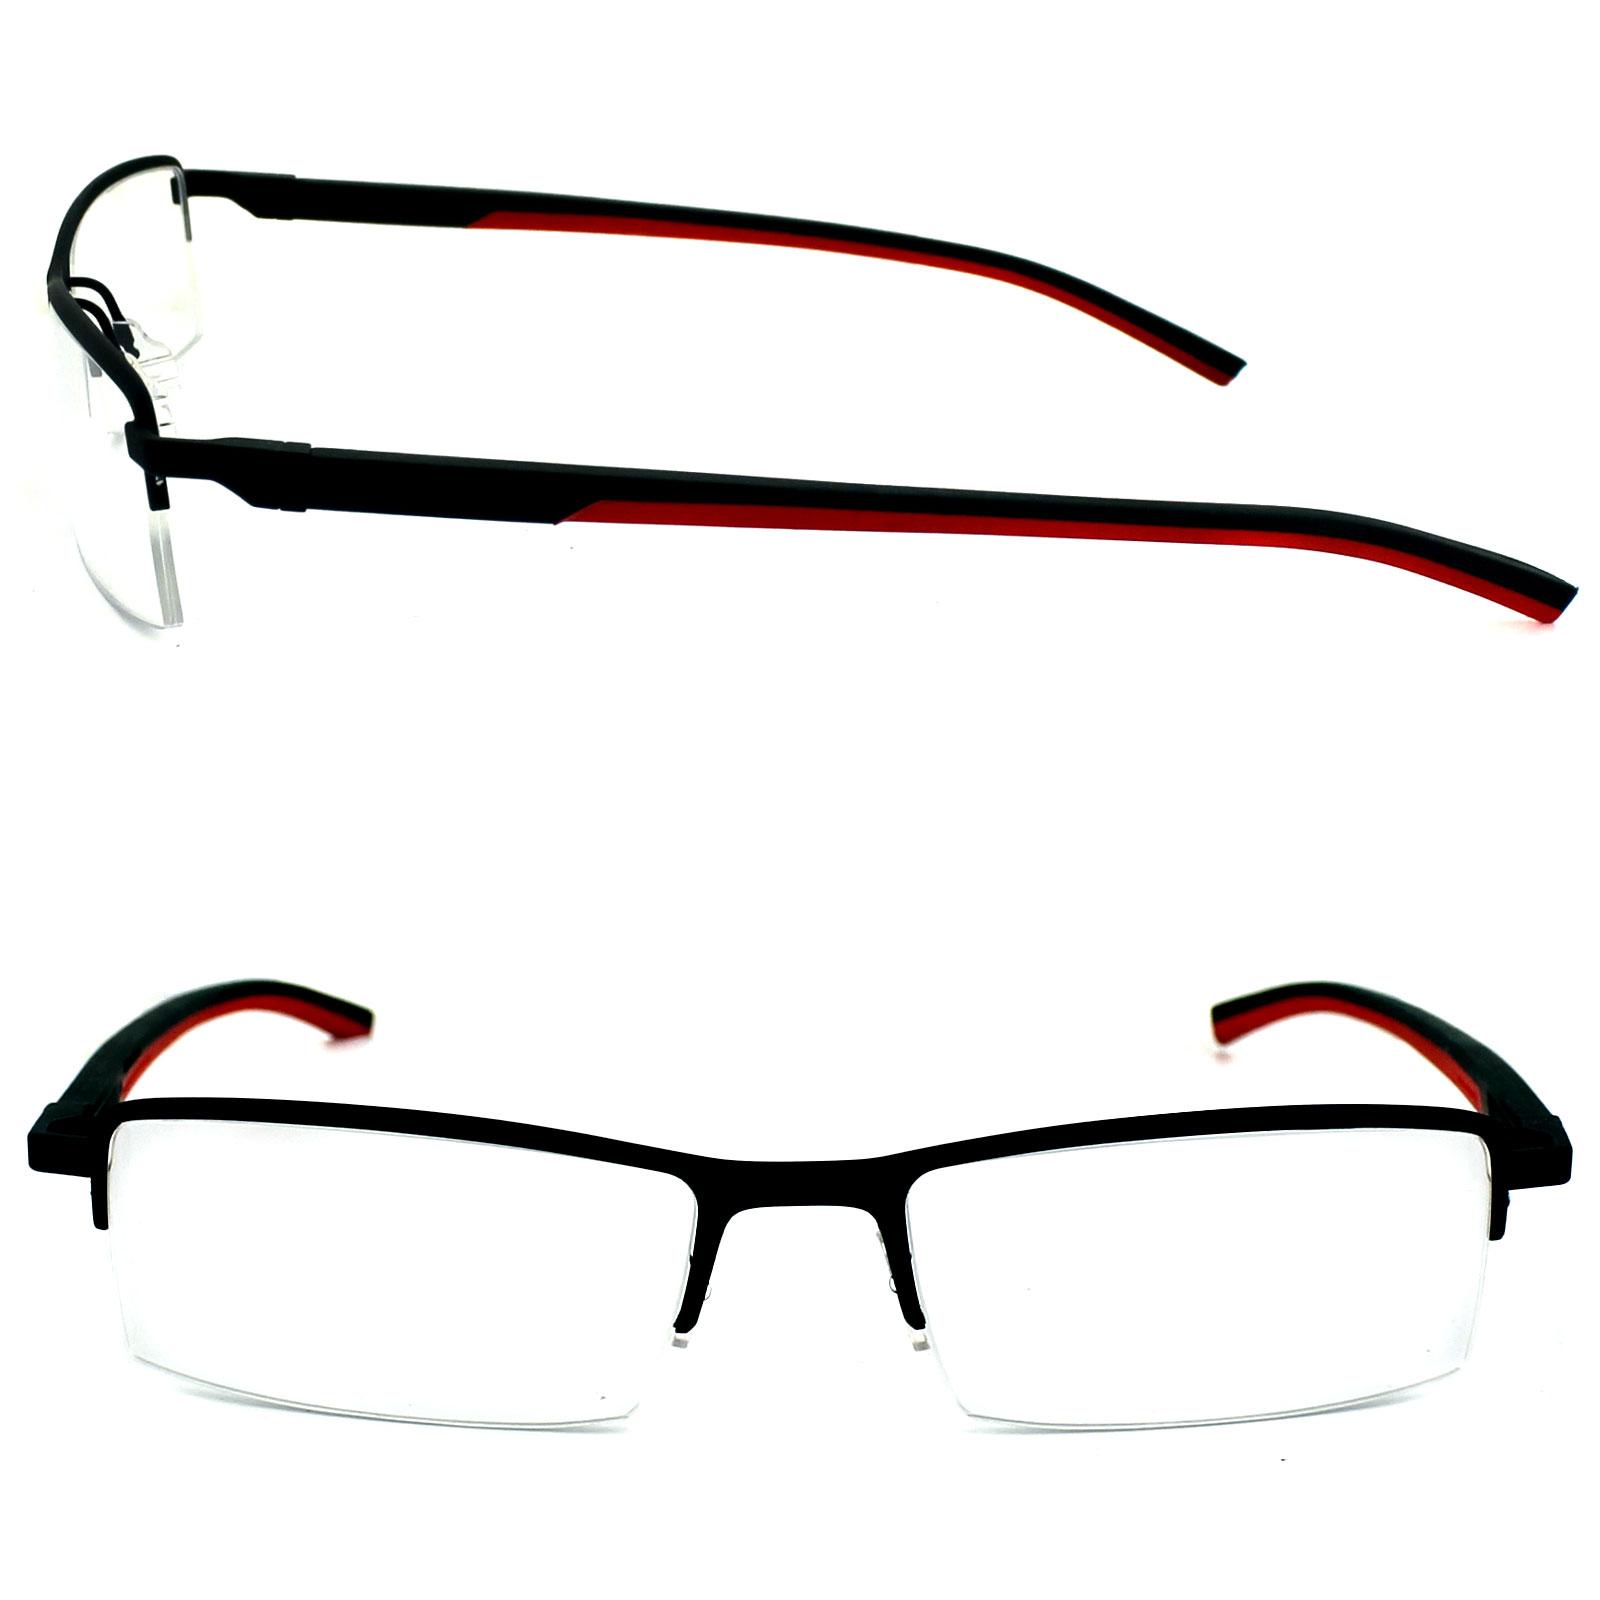 Tag heuer eyeglasses frames uk - Sentinel Tag Heuer Glasses Frames Automatic 0821 012 Matt Black Red